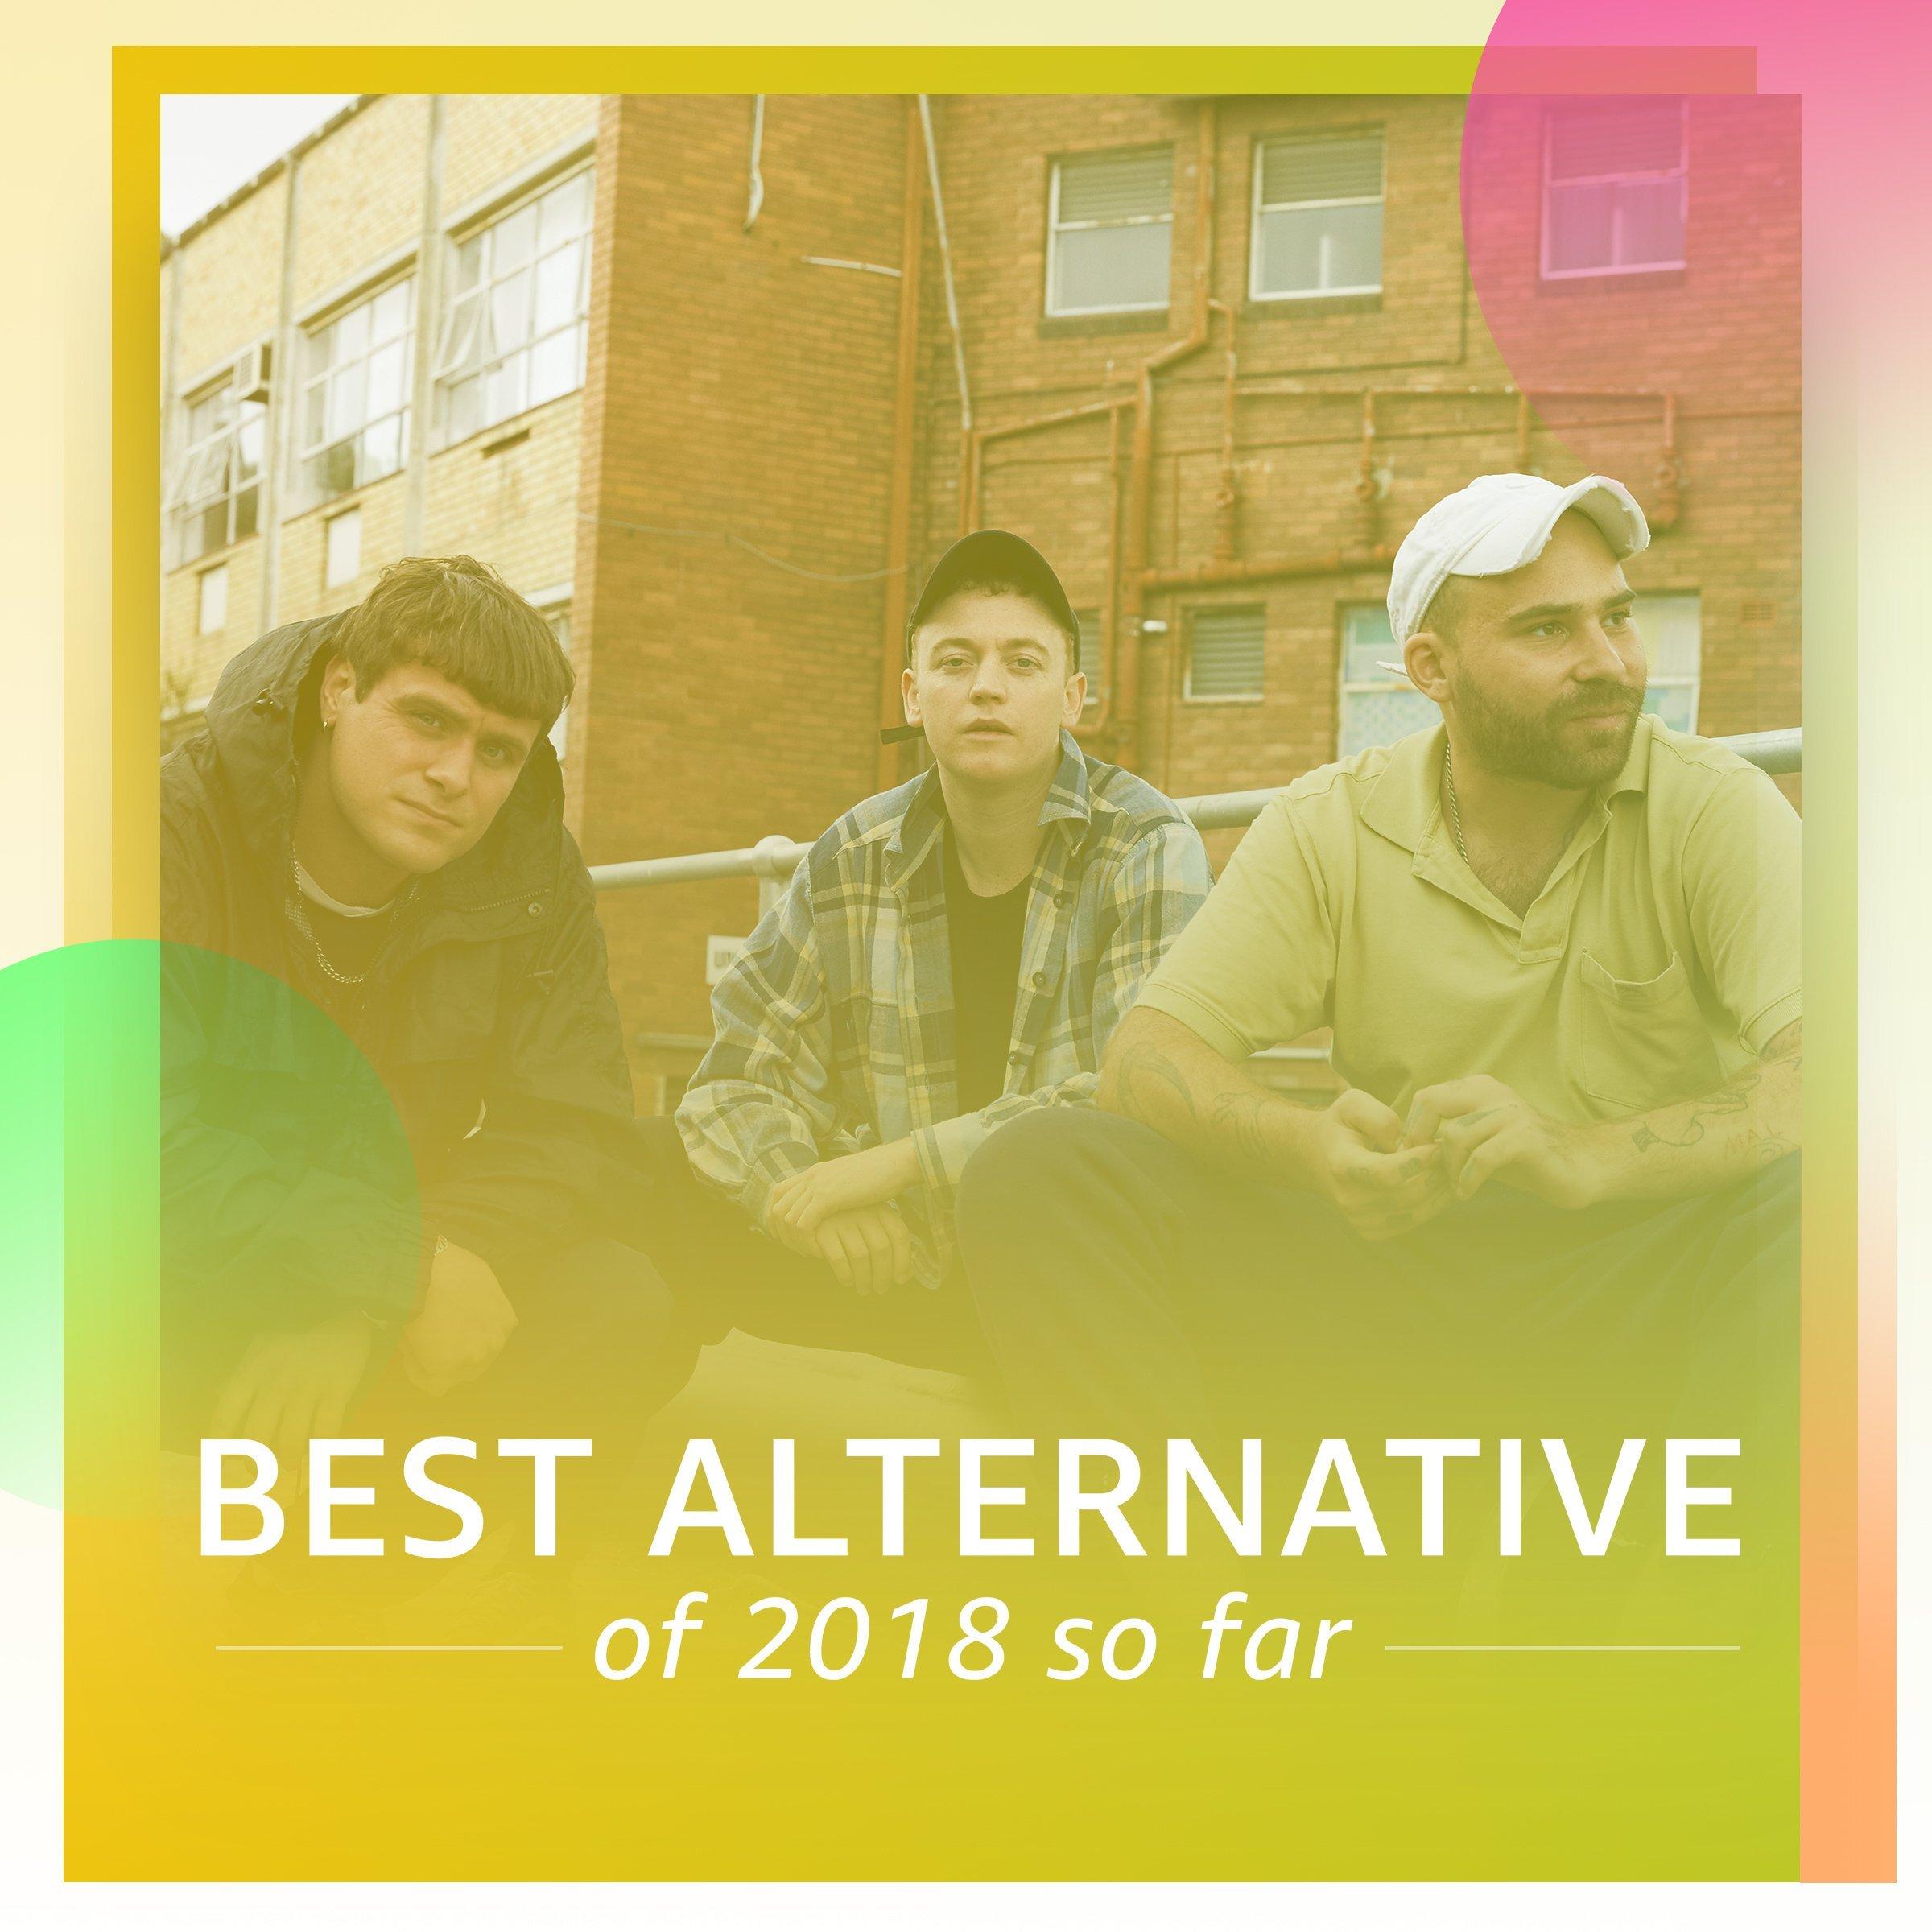 Best Alternative of 2018 So Far